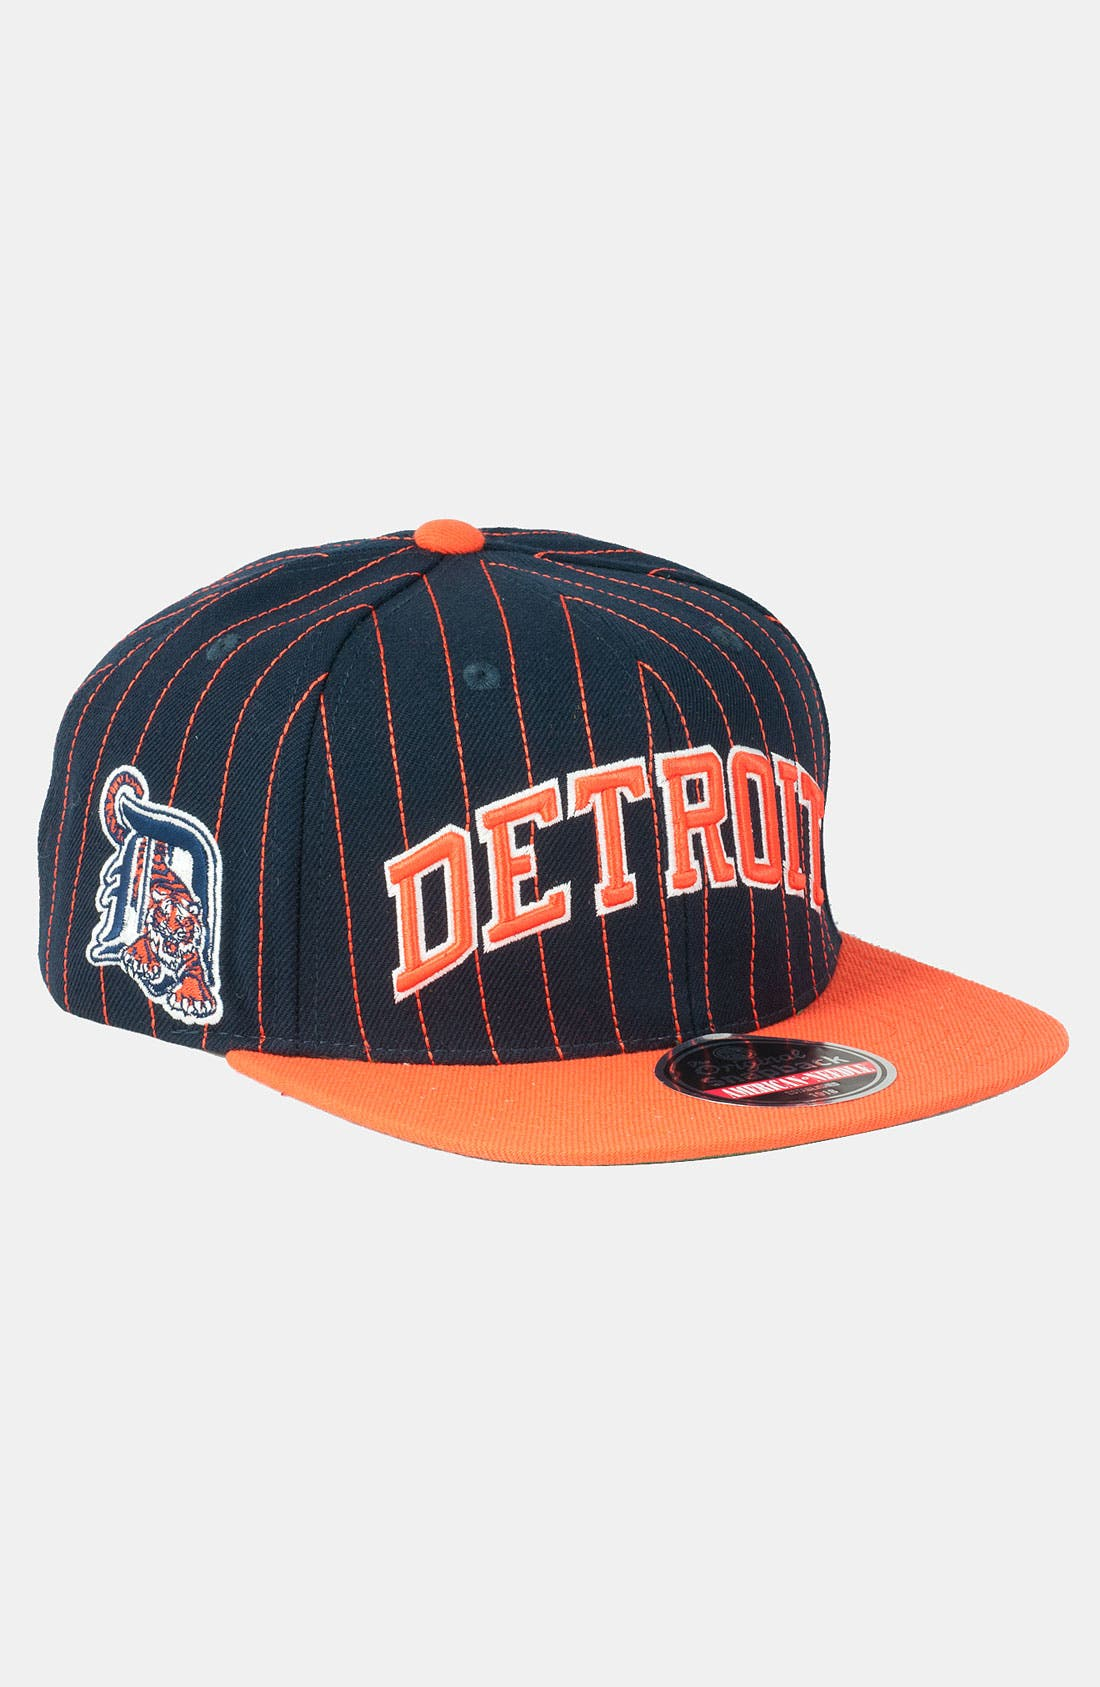 Main Image - American Needle 'Tigers' Snapback Baseball Cap